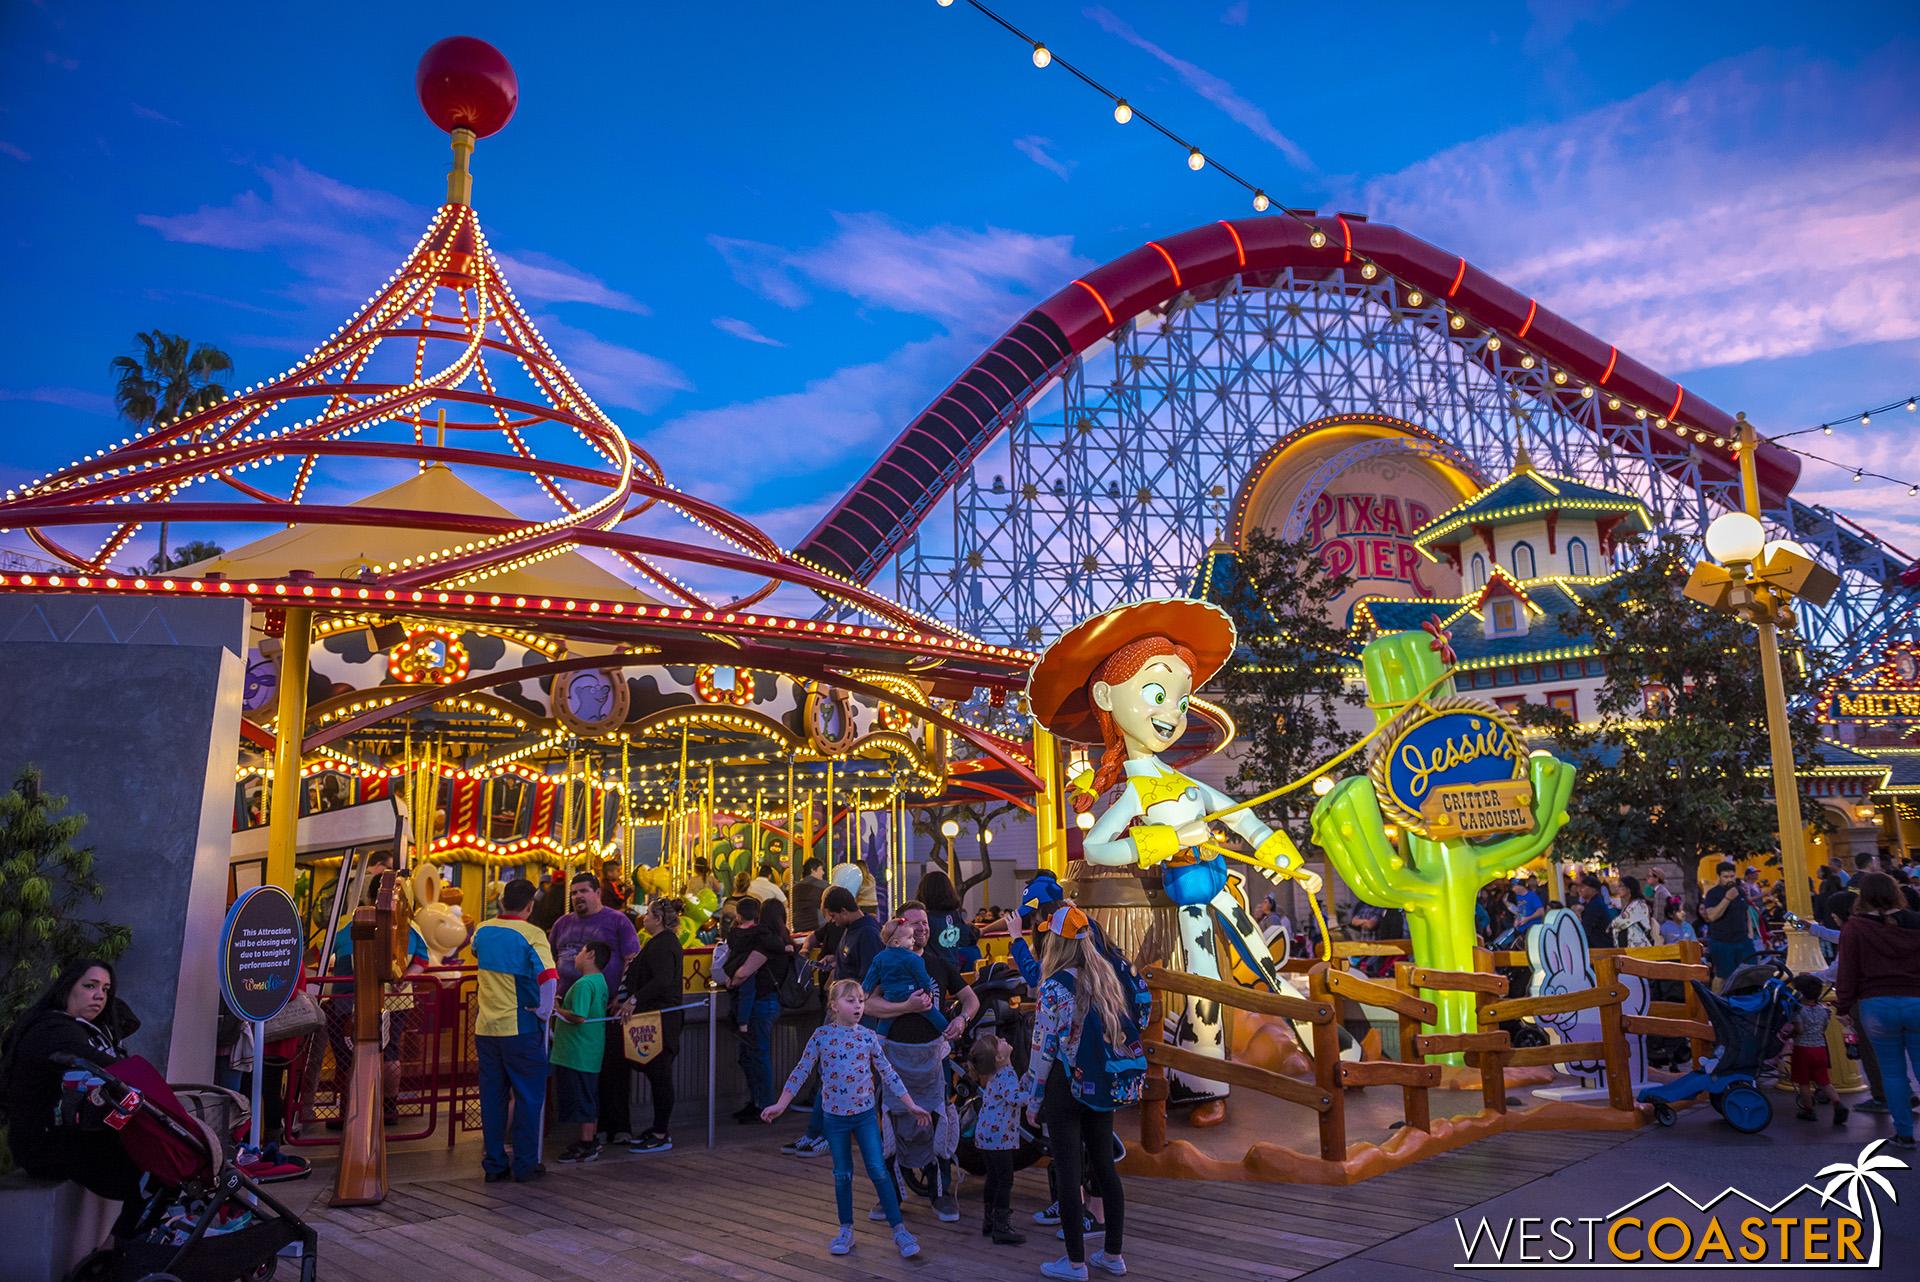 Jessie's Critter Carousel is open!